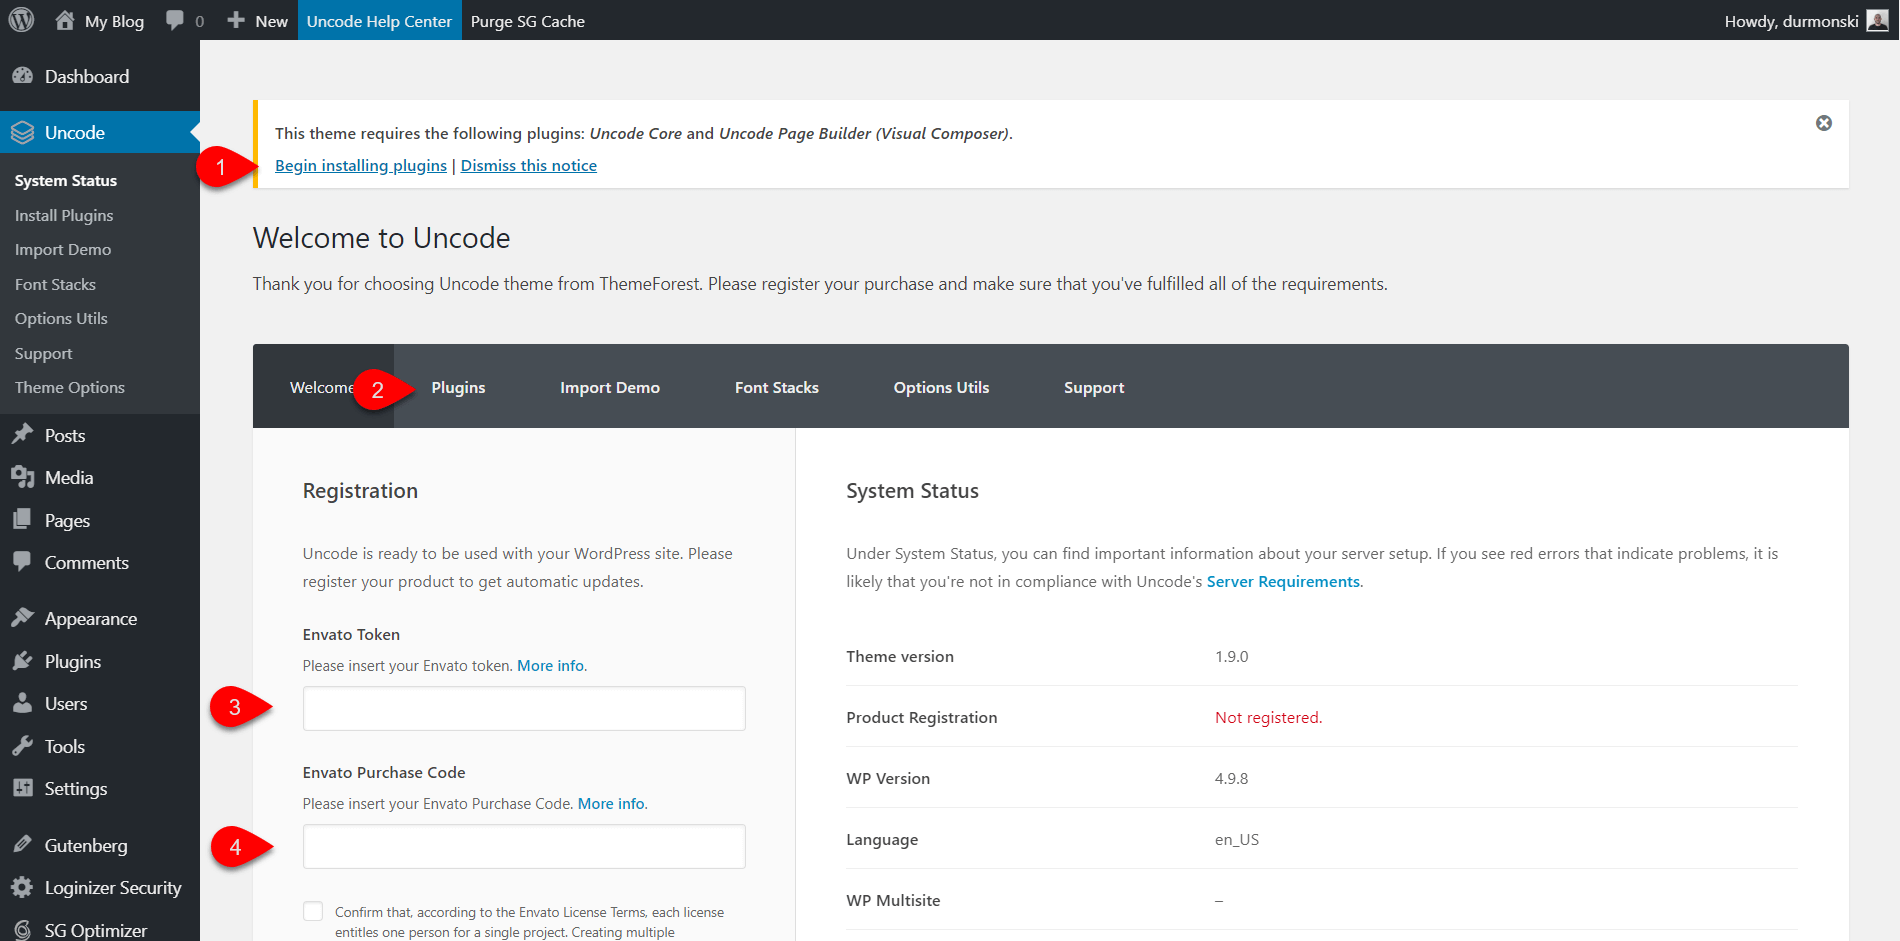 Uncode WordPress Theme Settings